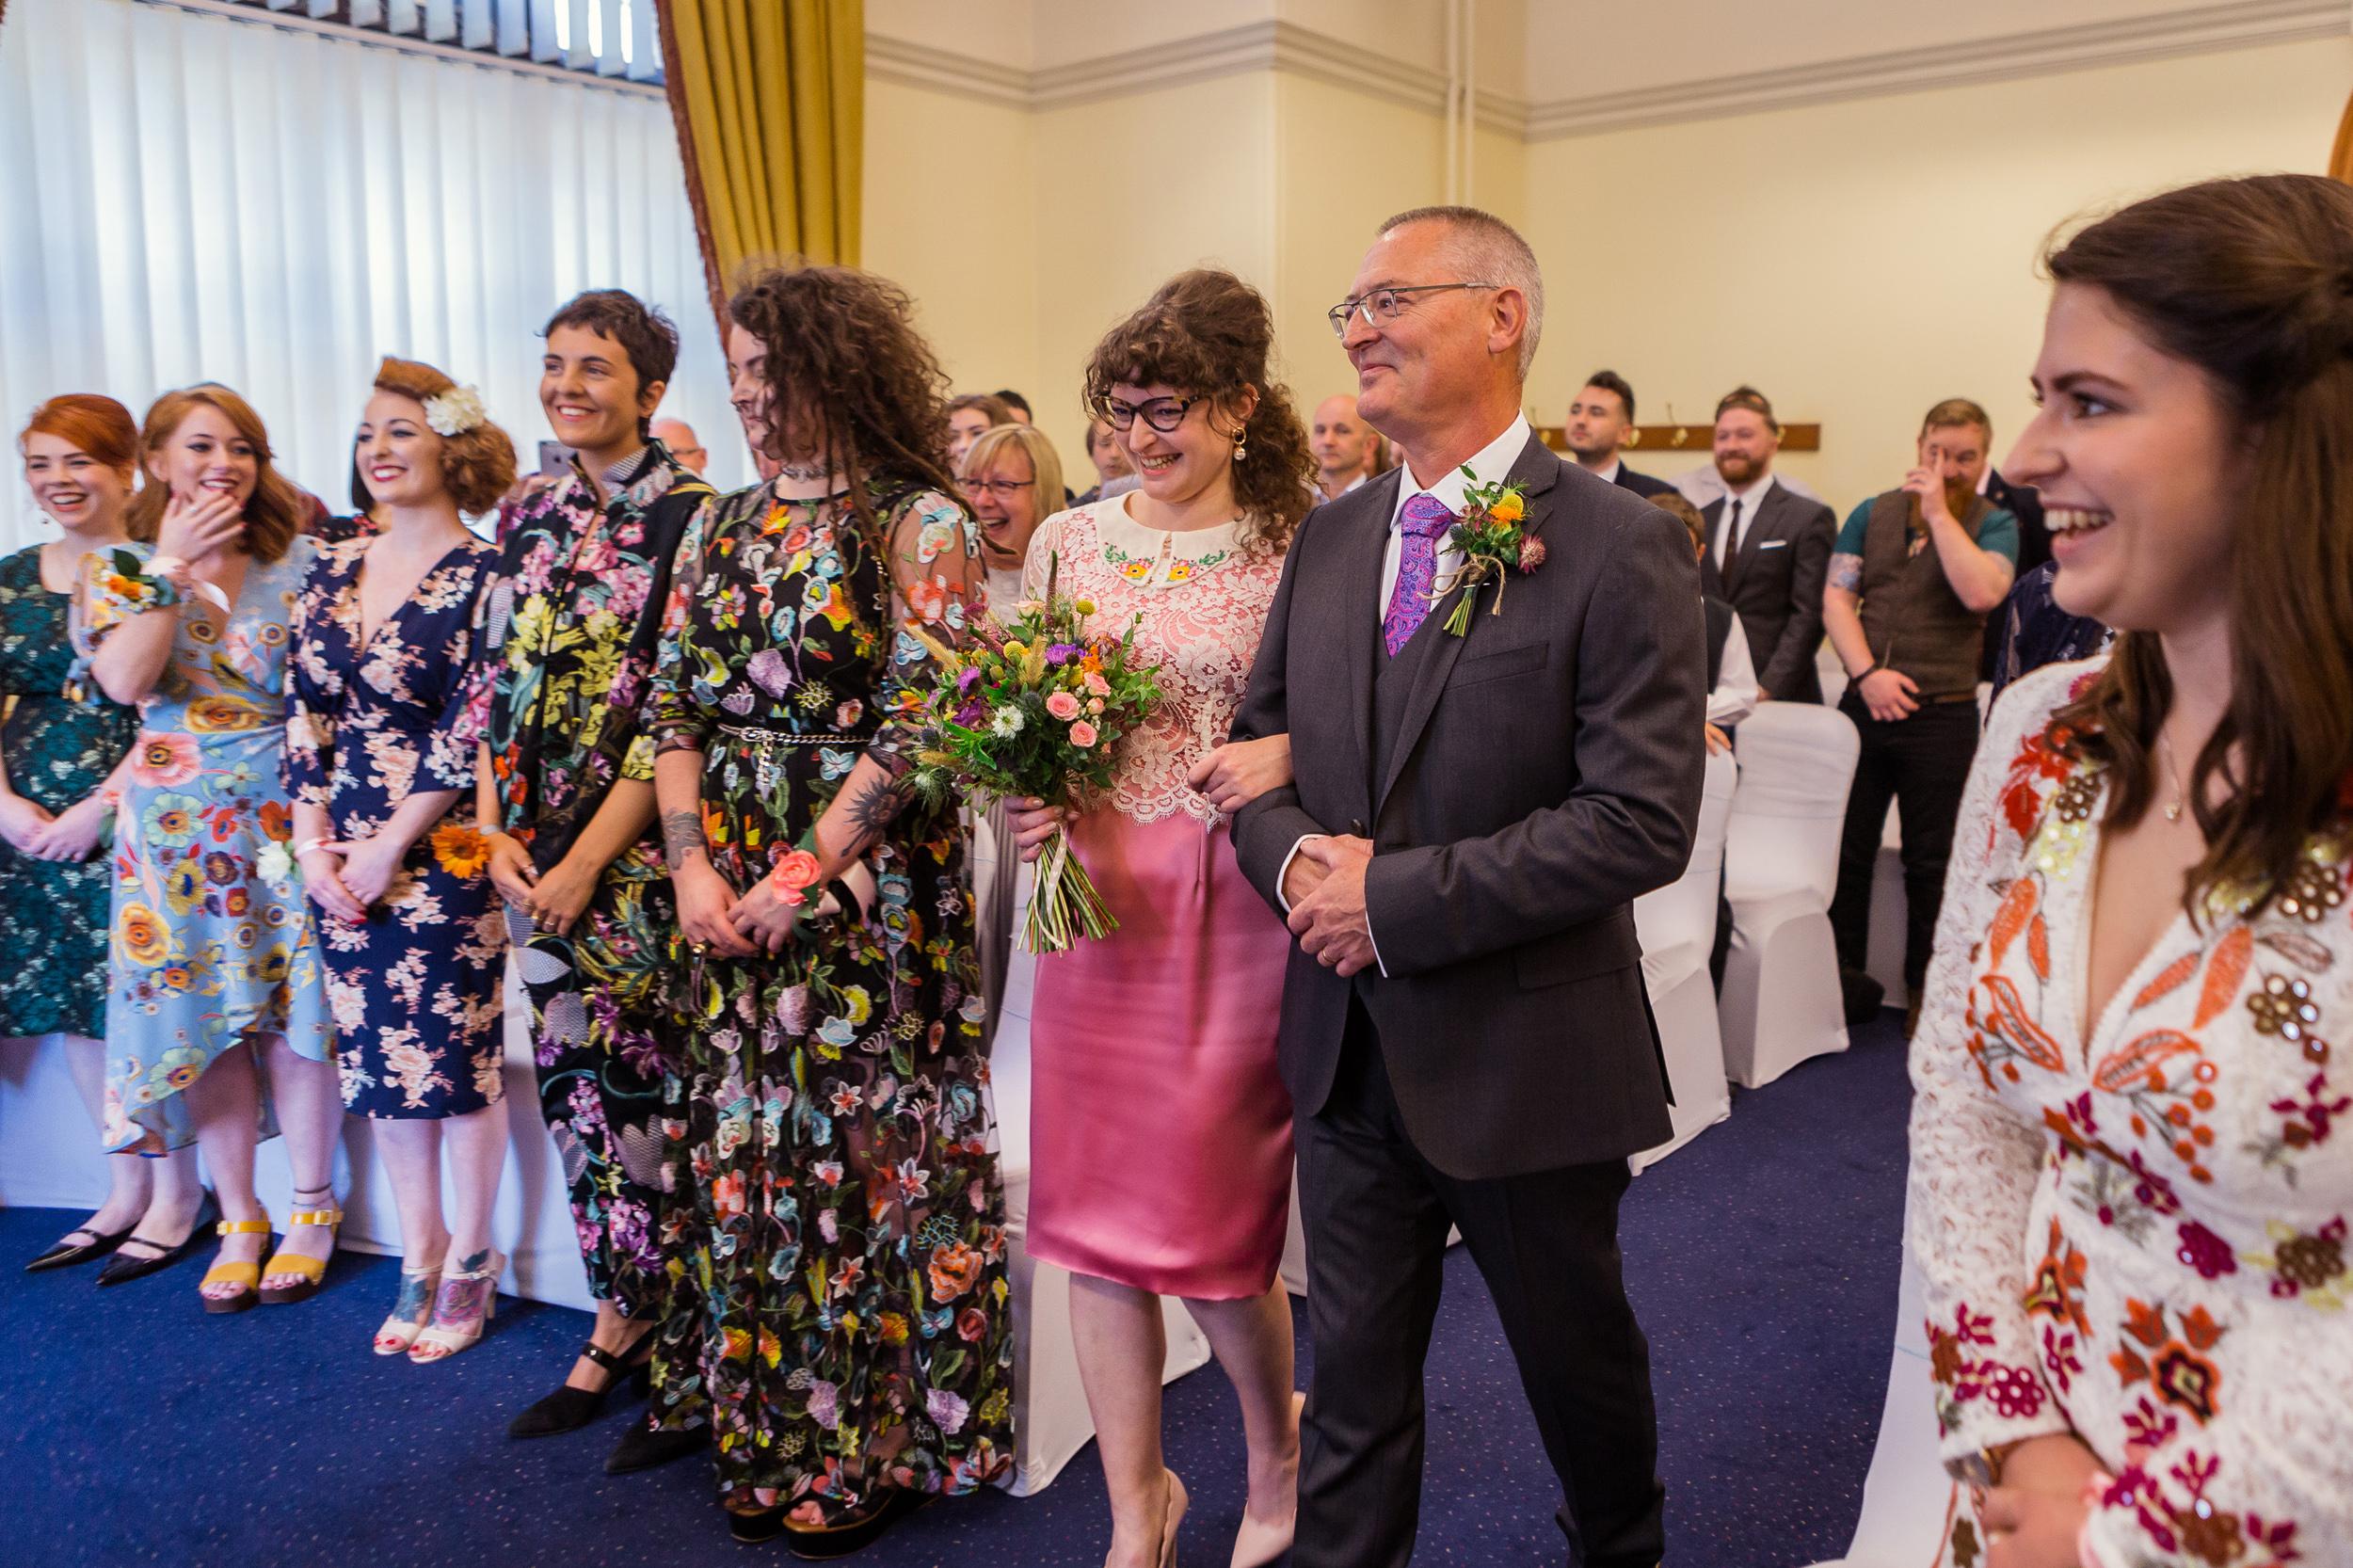 Emma-Coloured-Wedding-Dress-Sheffield-Kate-Beaumont-5.jpg